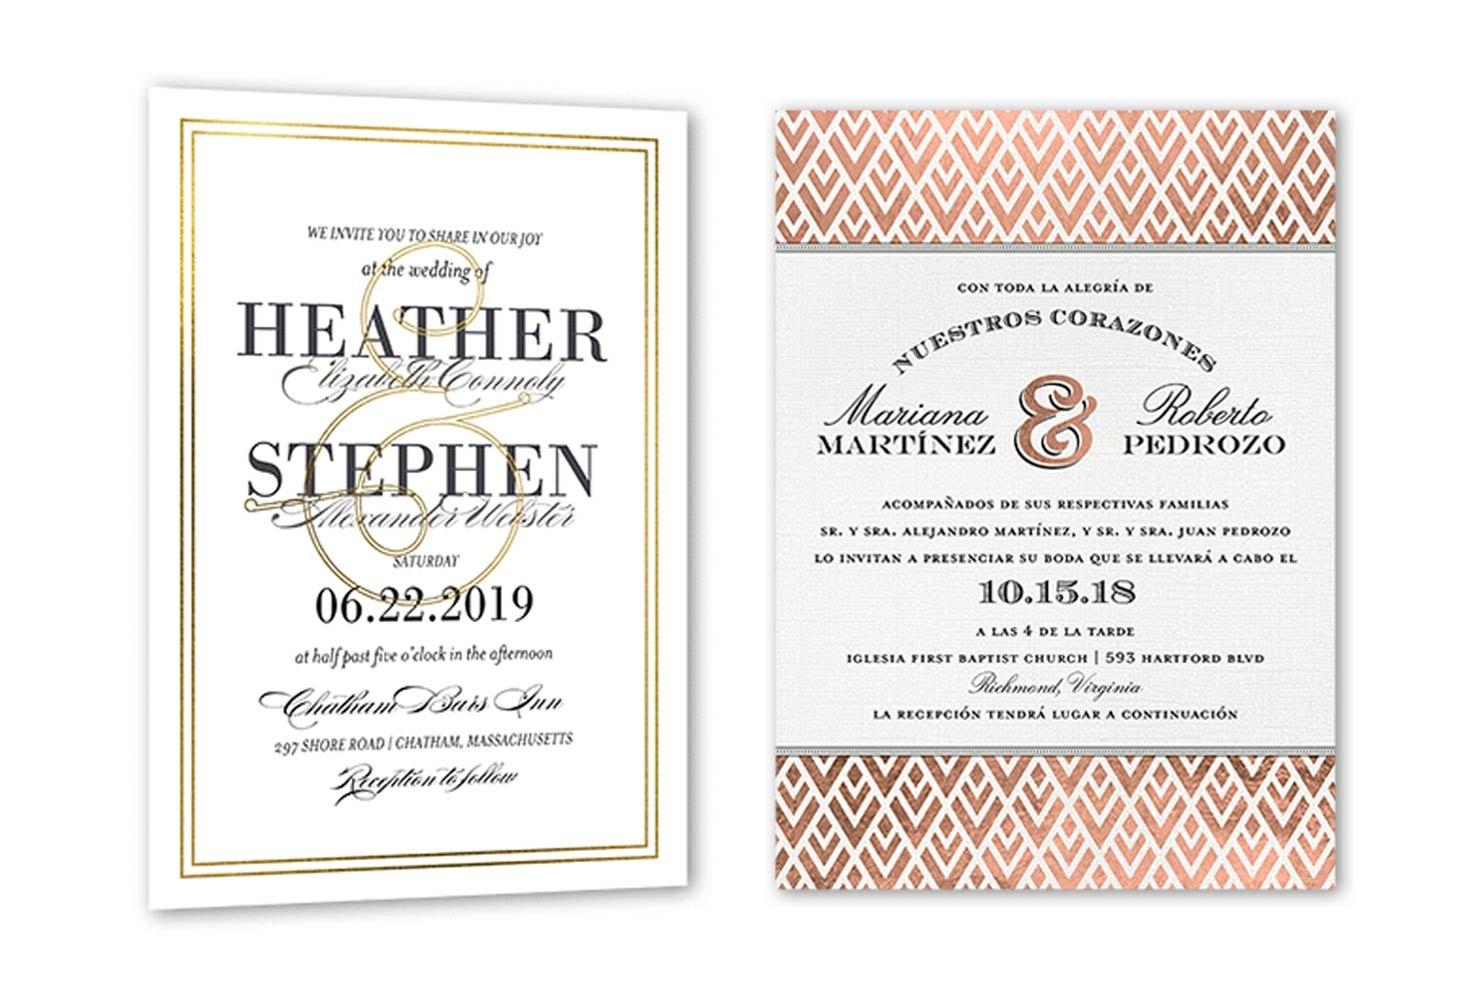 Wedding Invitation Wording Examples   Shutterfly Inside Church Wedding Invitation Card Template